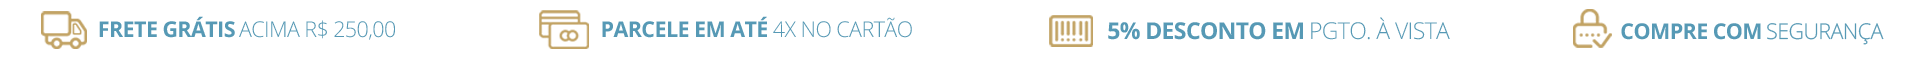 Tarja benefícios